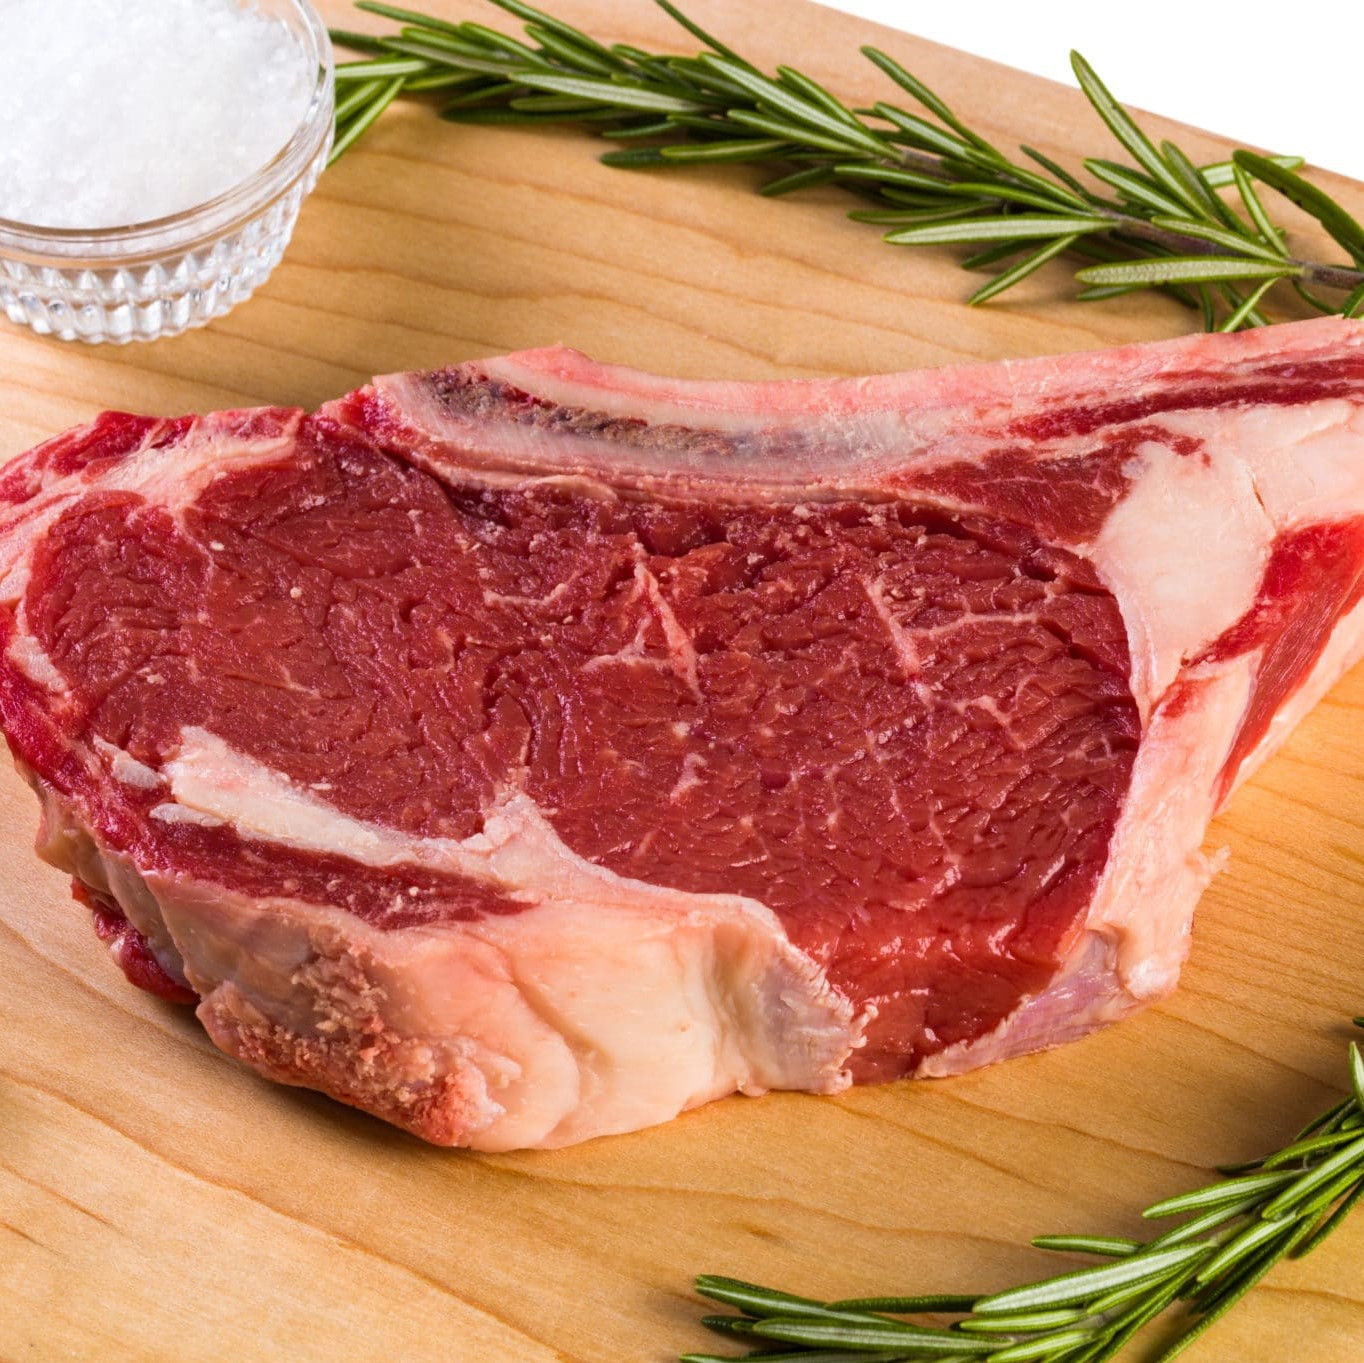 Beef - Rib Steak (Bone-In)